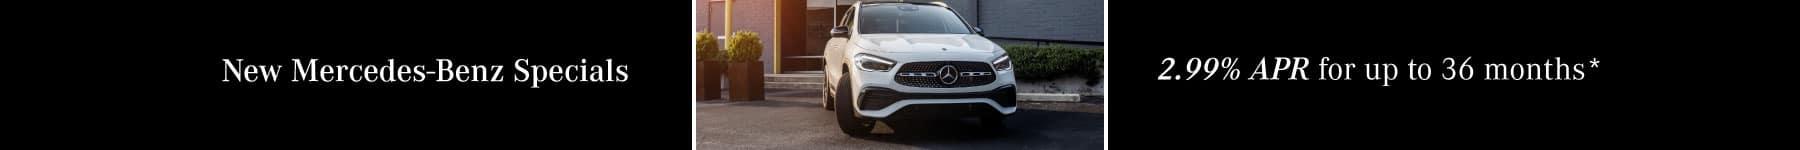 Mercedes-Benz of Chandler new 2021 mercedes benz specials